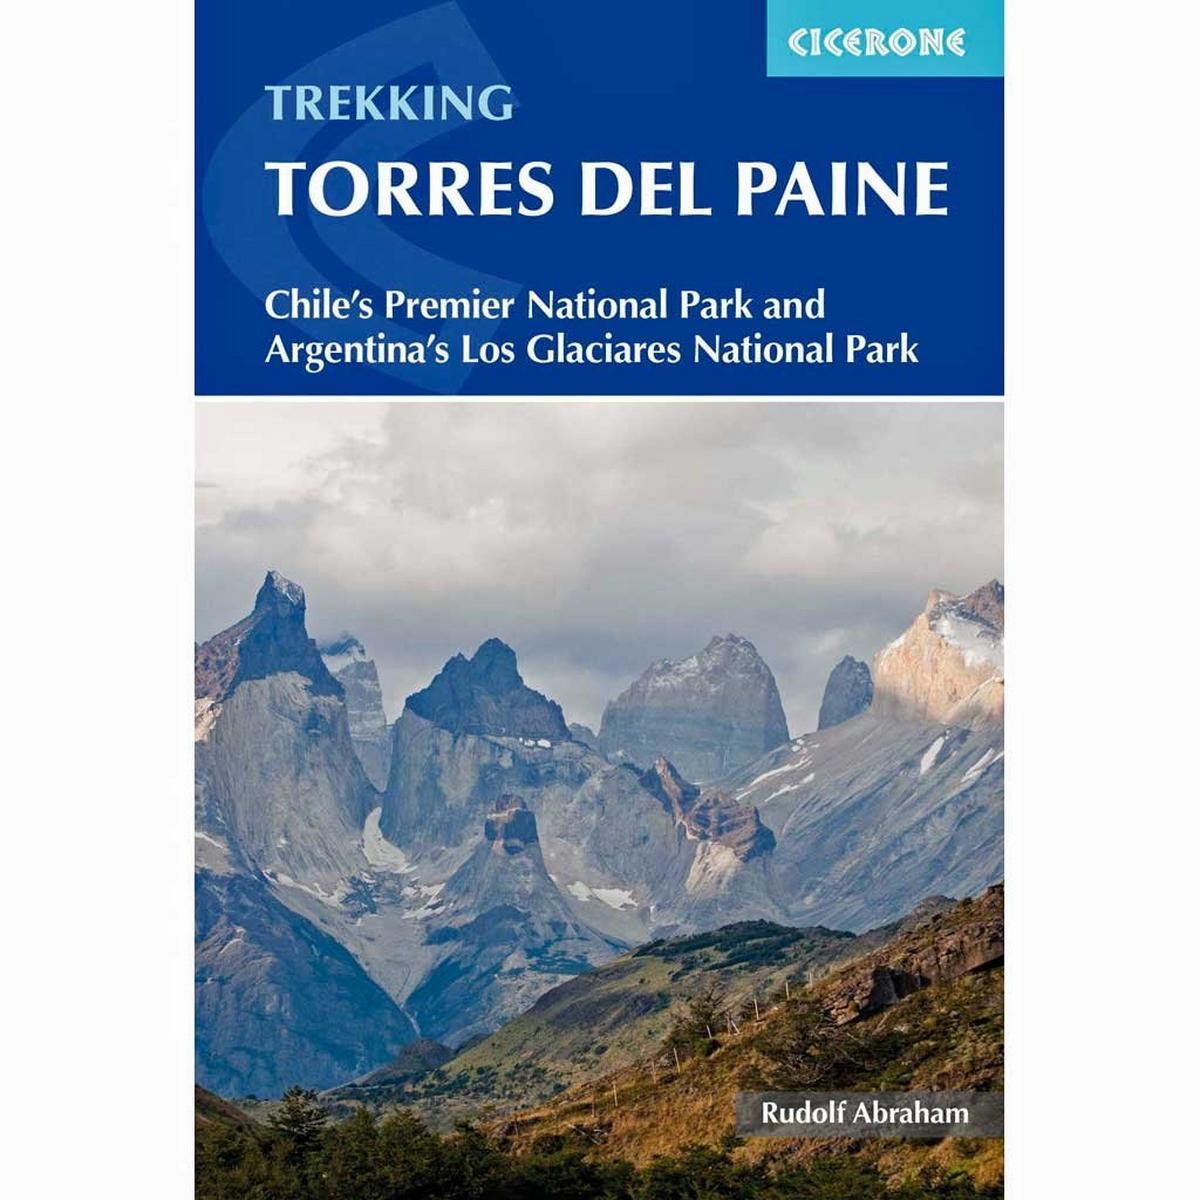 Cicerone Trekking Guide Book: Torres del Paine